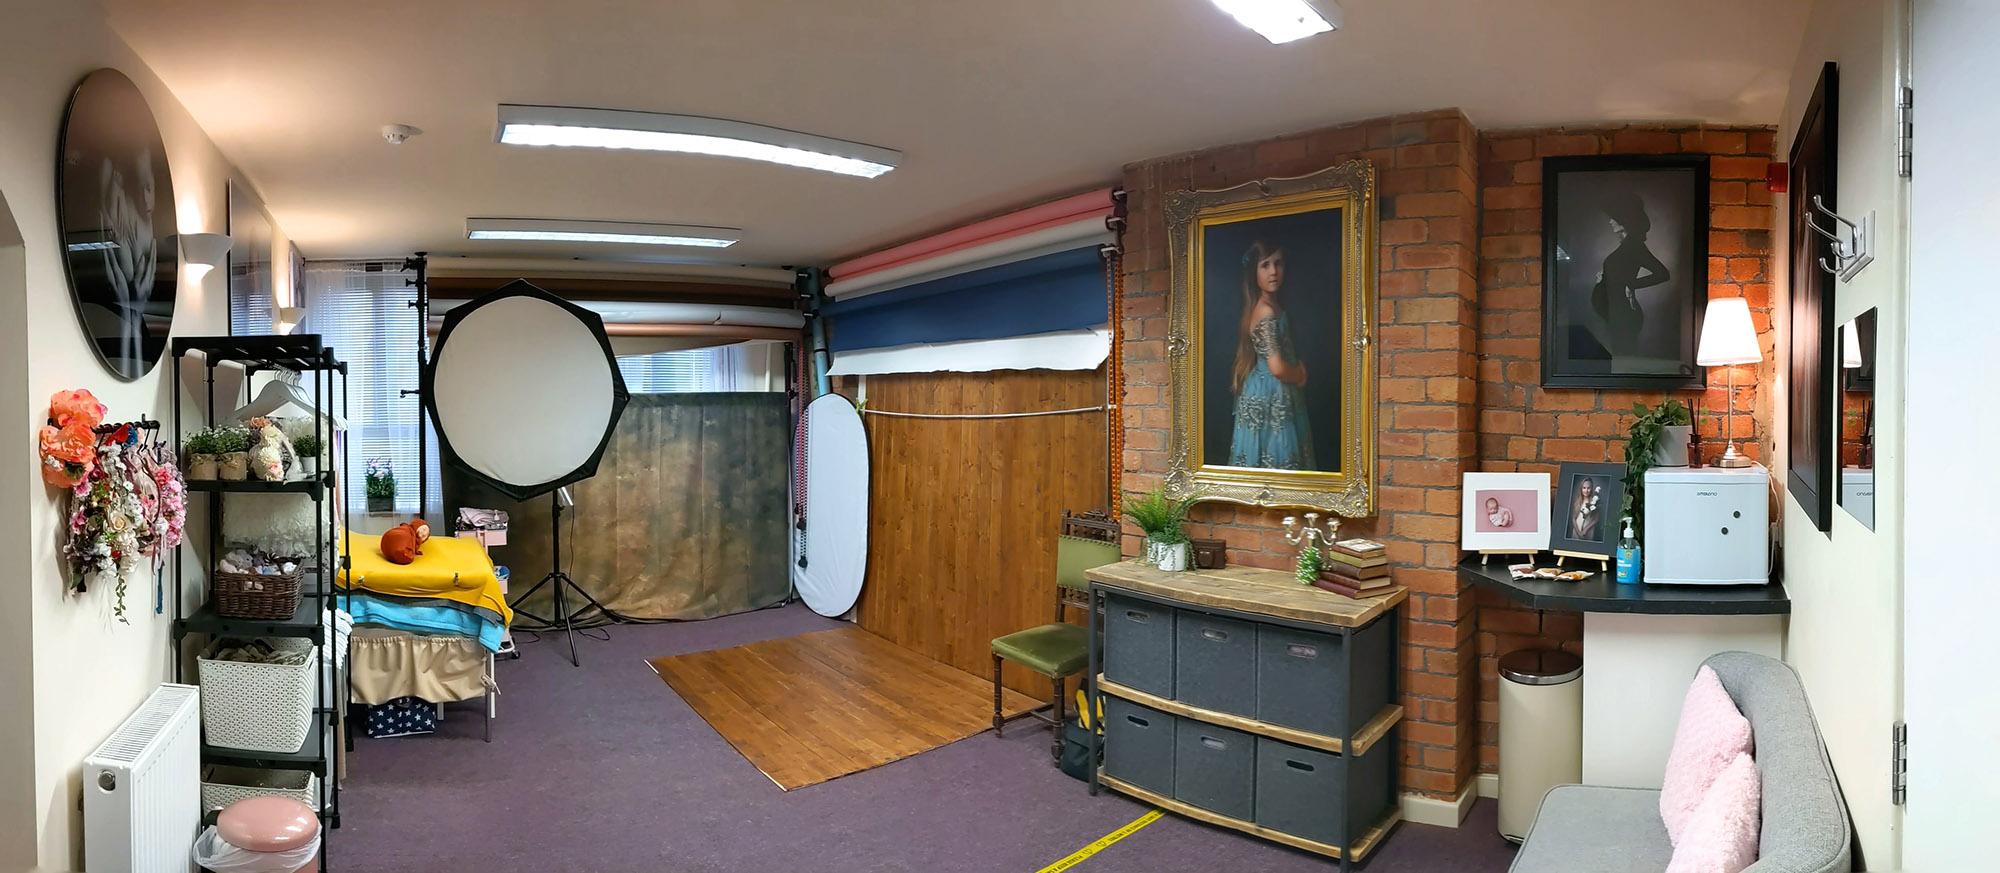 Sarah Walton Photography | The Studio | Steeton | Keighley | West Yorkshire